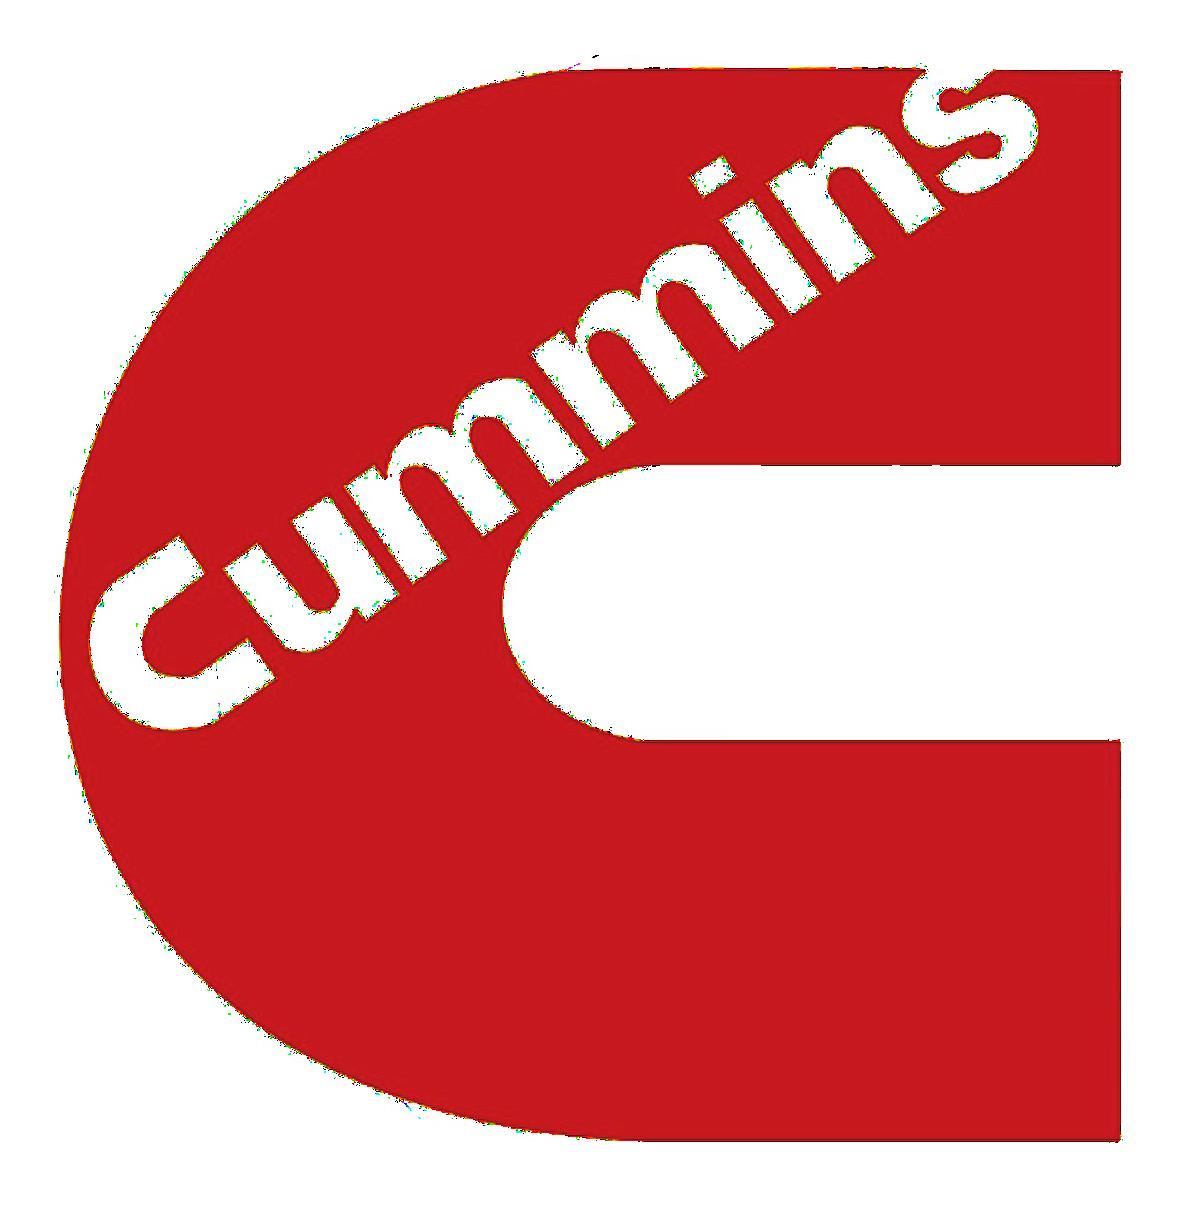 Cummins Logo Png Image Cummins Big Rig Trucks Logos